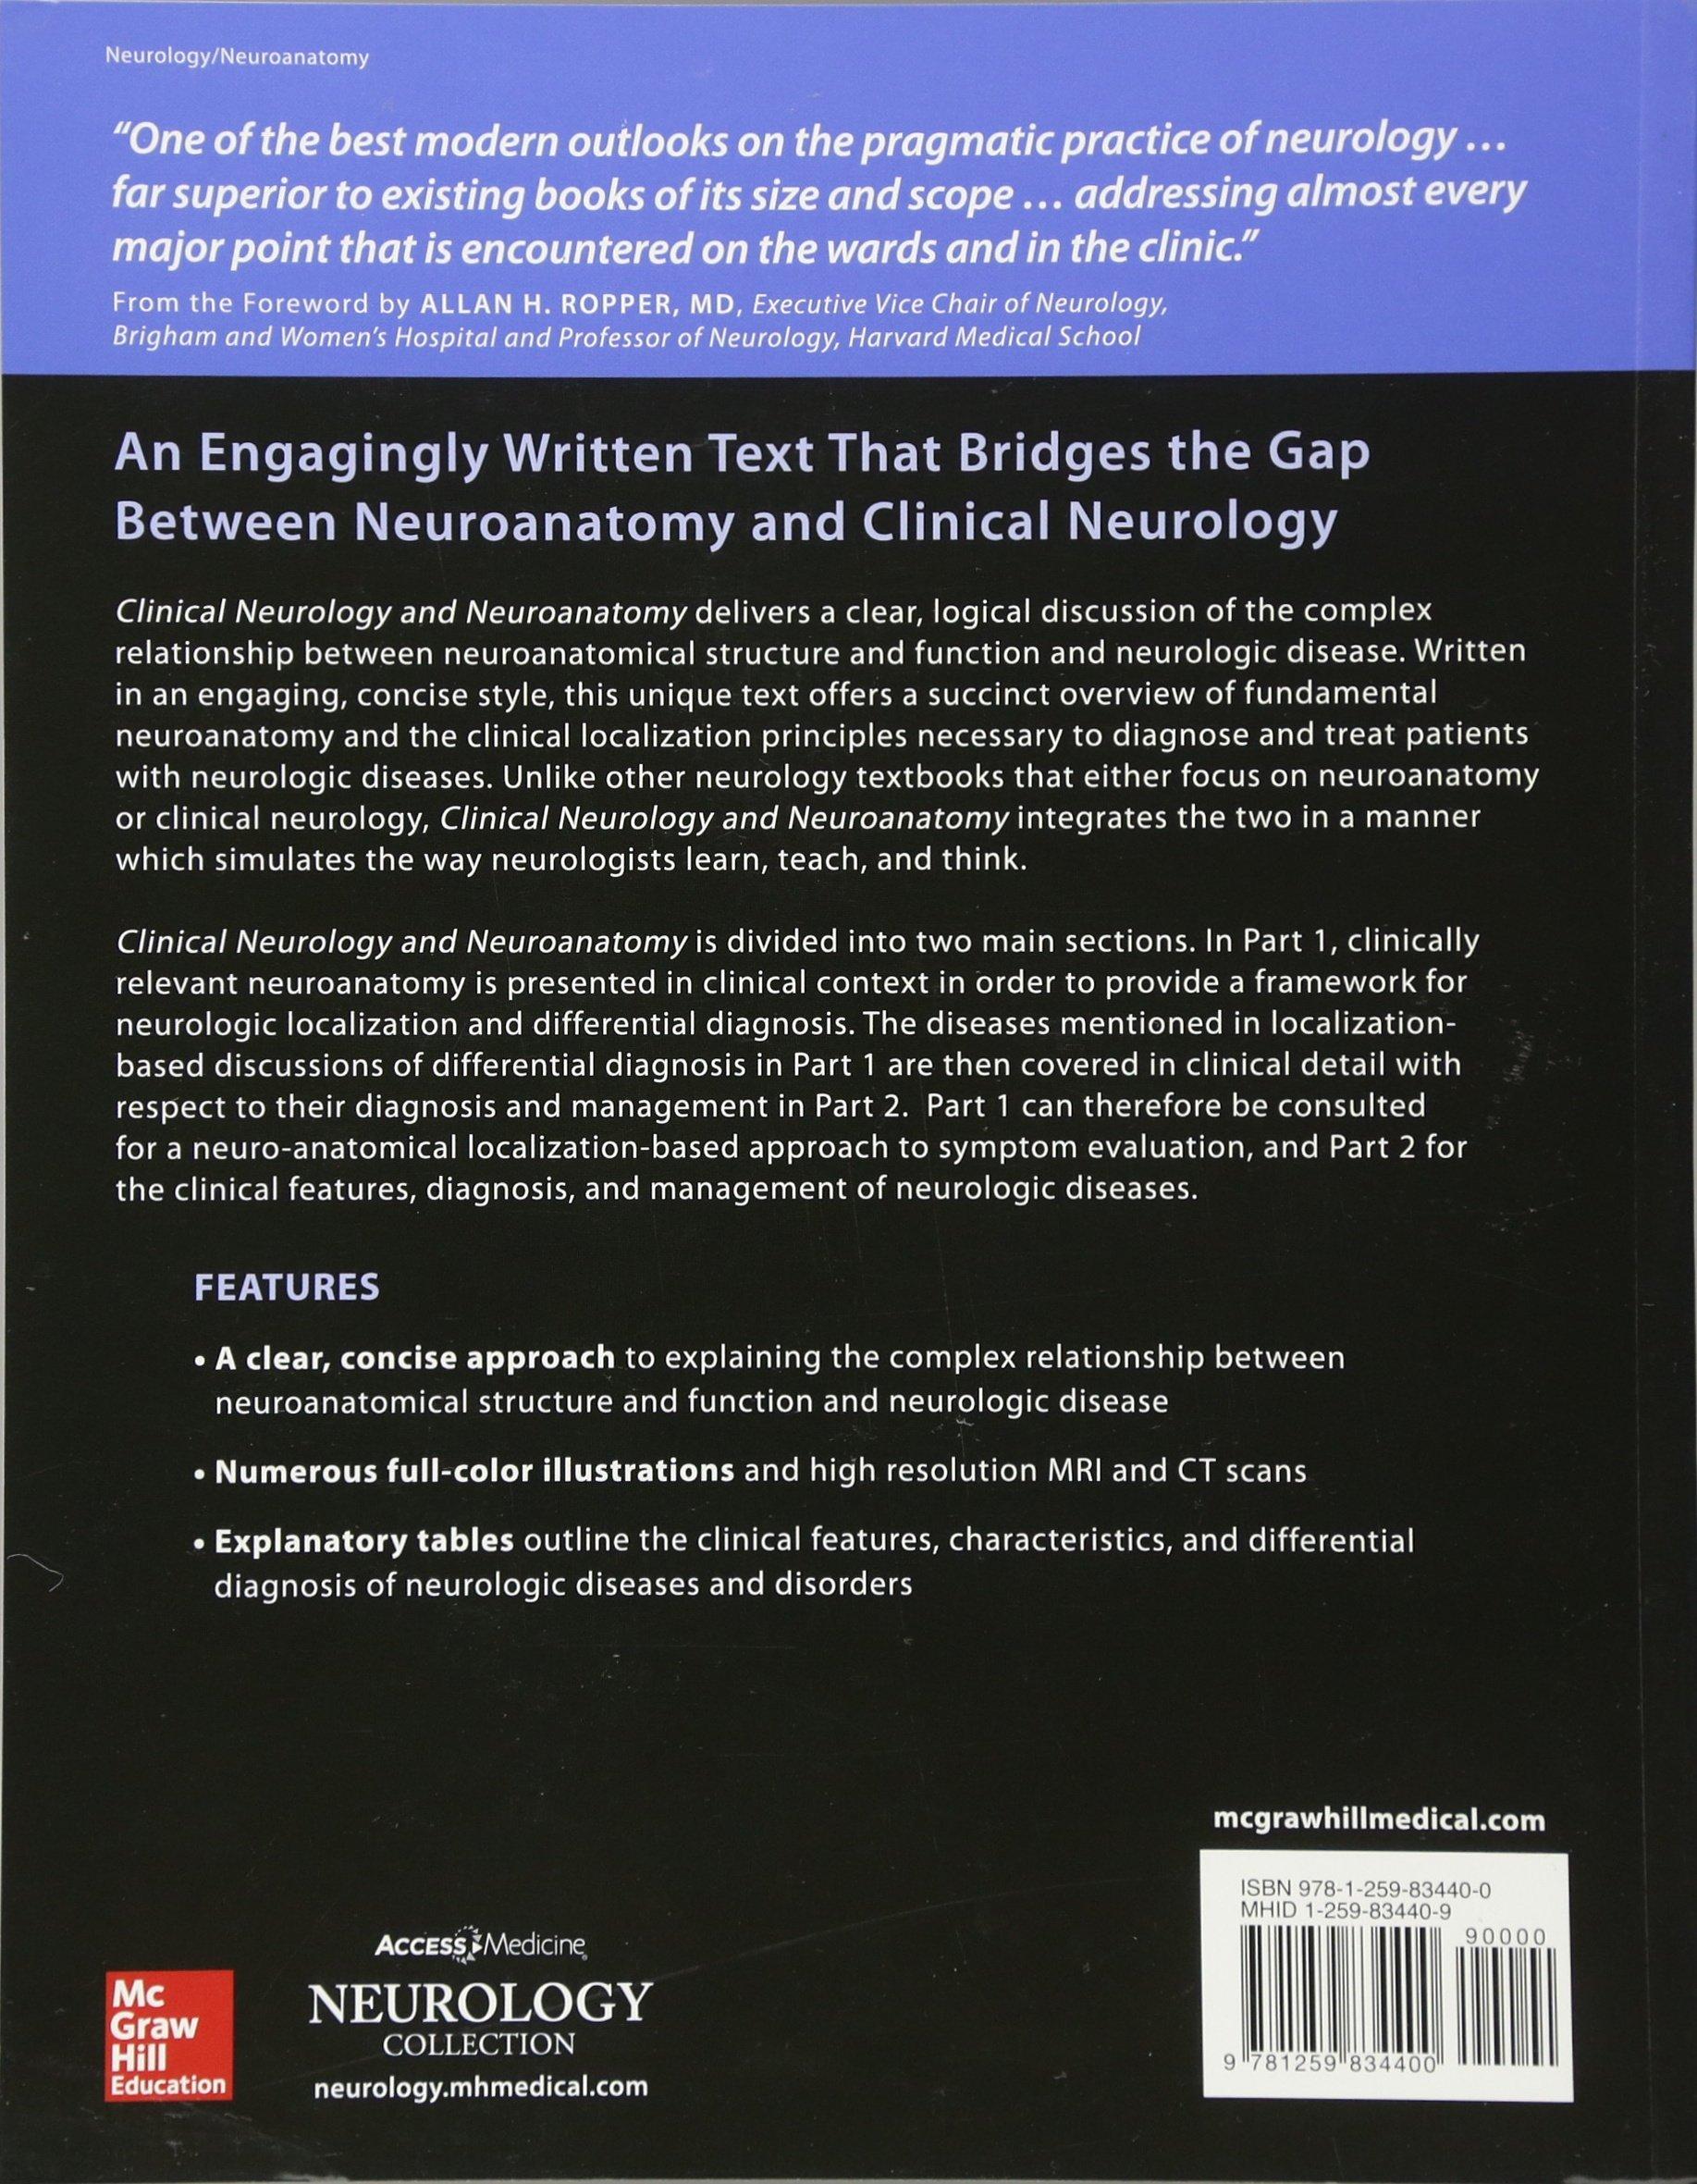 Lange clinical neurology and neuroanatomy a localization based lange clinical neurology and neuroanatomy a localization based approach livros na amazon brasil 9781259834400 fandeluxe Images